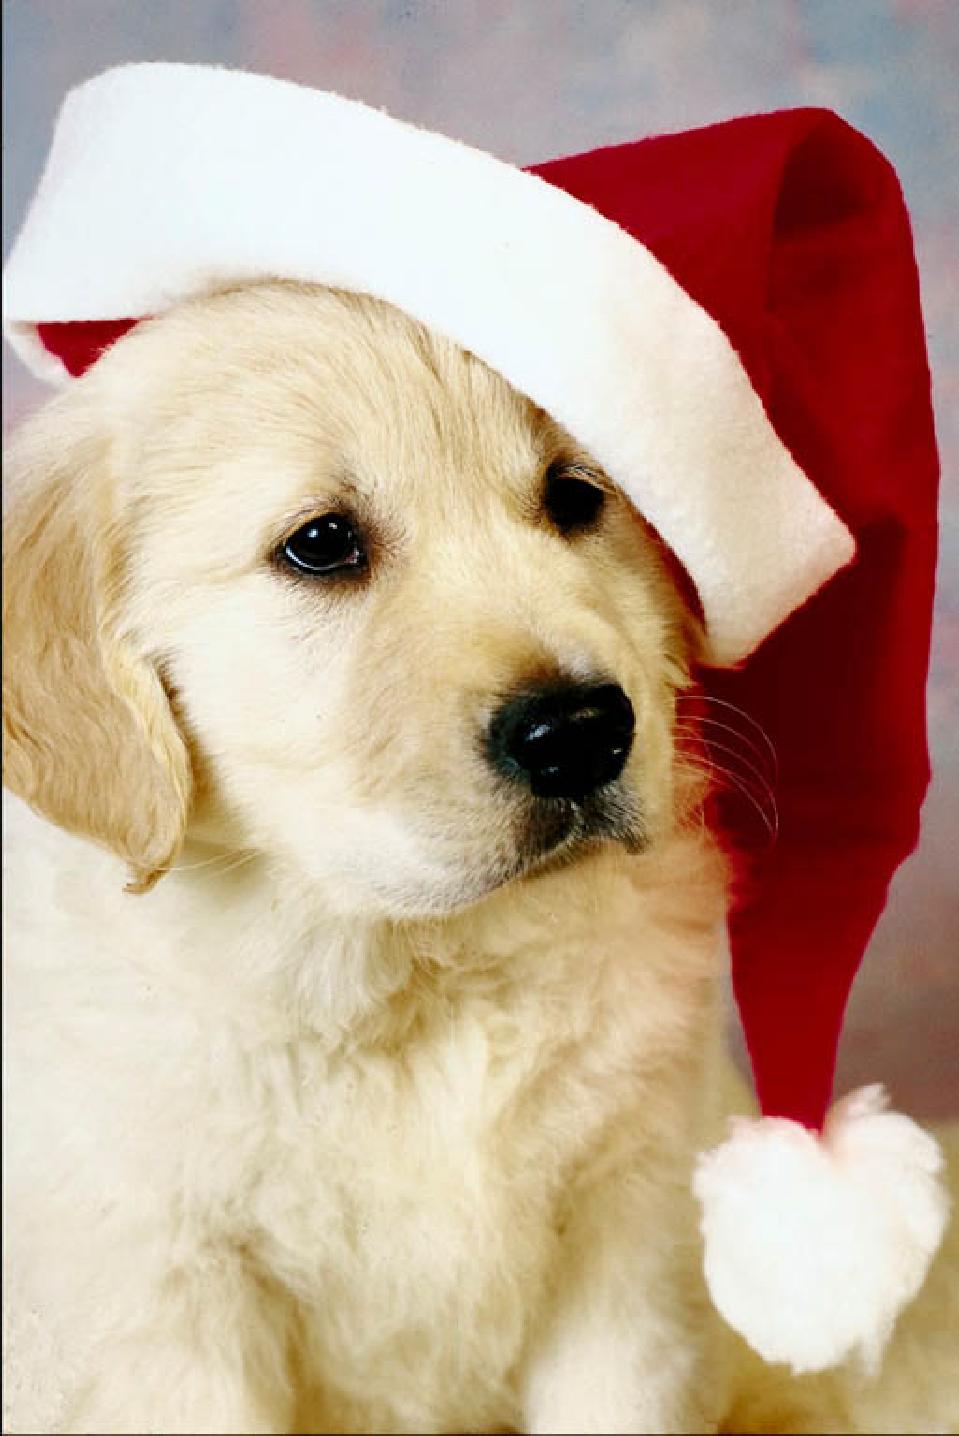 46+] Christmas Puppy Wallpaper for Computer on WallpaperSafari